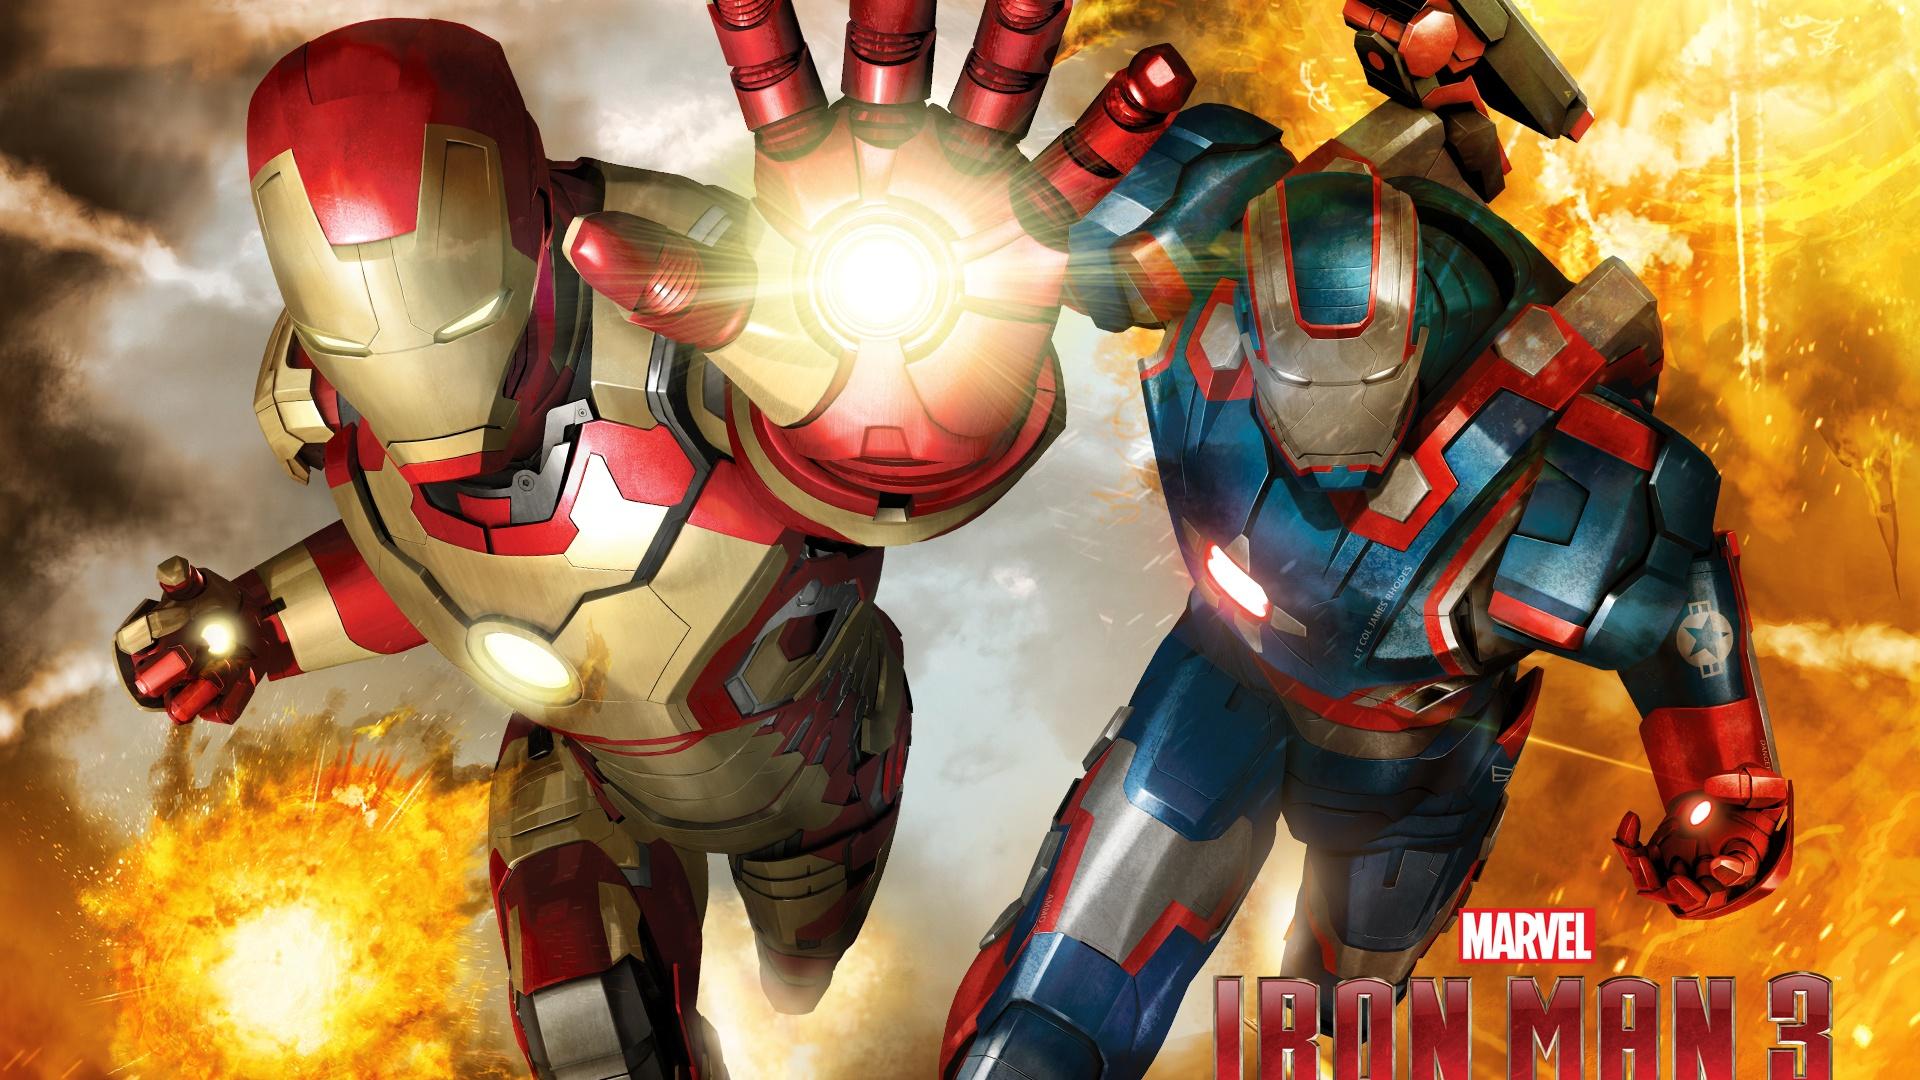 Hd wallpaper iron man - Iron Man 3 Armure Diff 233 Rente Fonds D 233 Cran 1920x1080